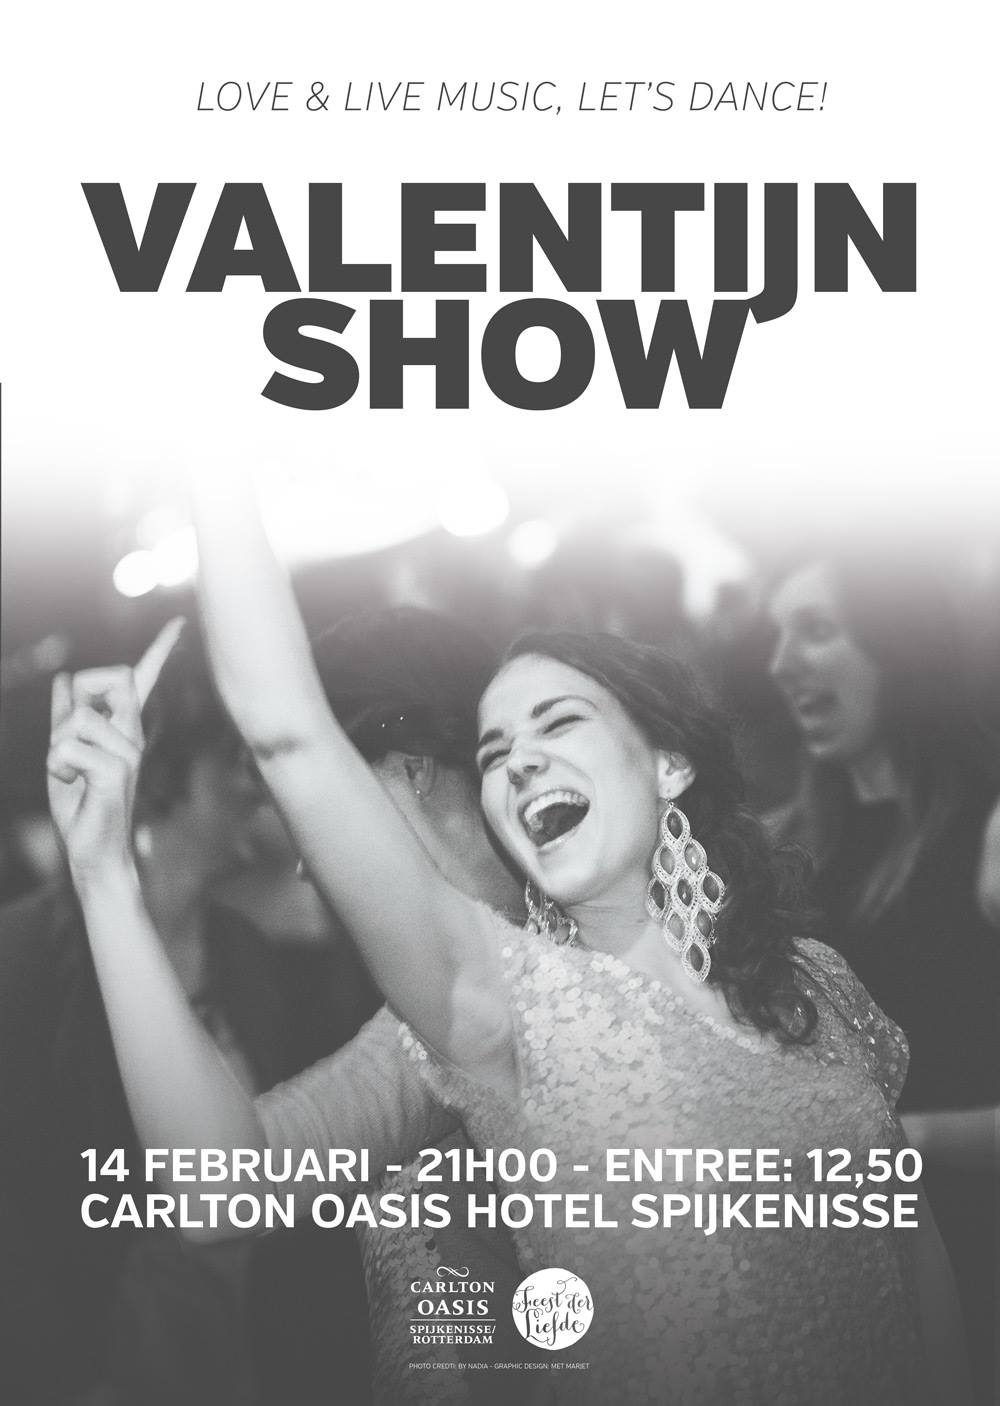 Feest der Liefde Valentijn Show Editie 3 2015 Poster